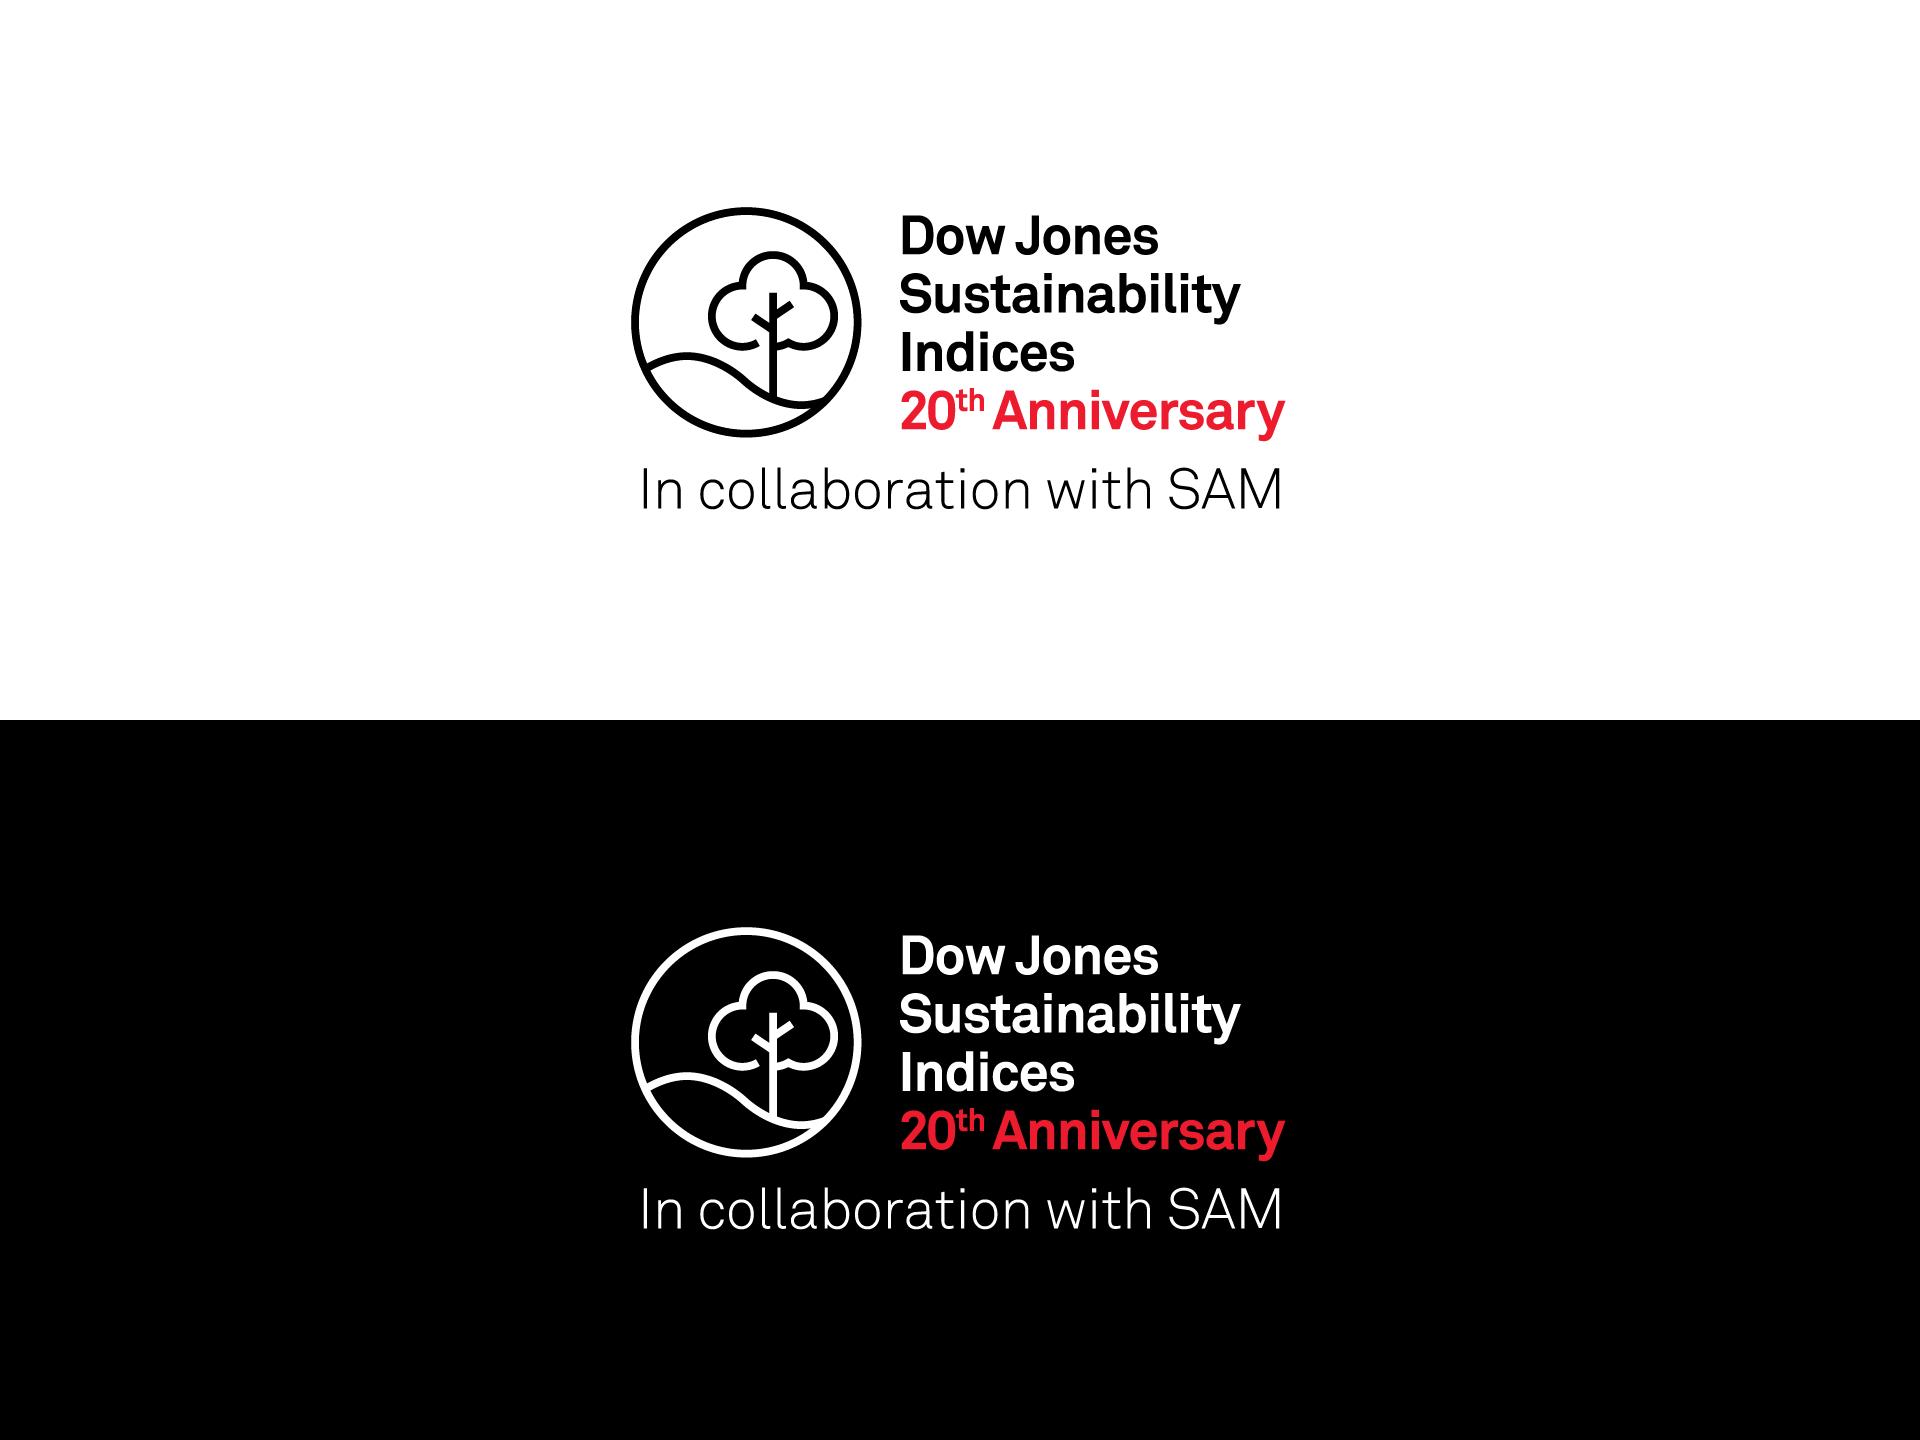 Yu Bando Mooney Dow Jones Indices Sustainability Indices Stamp